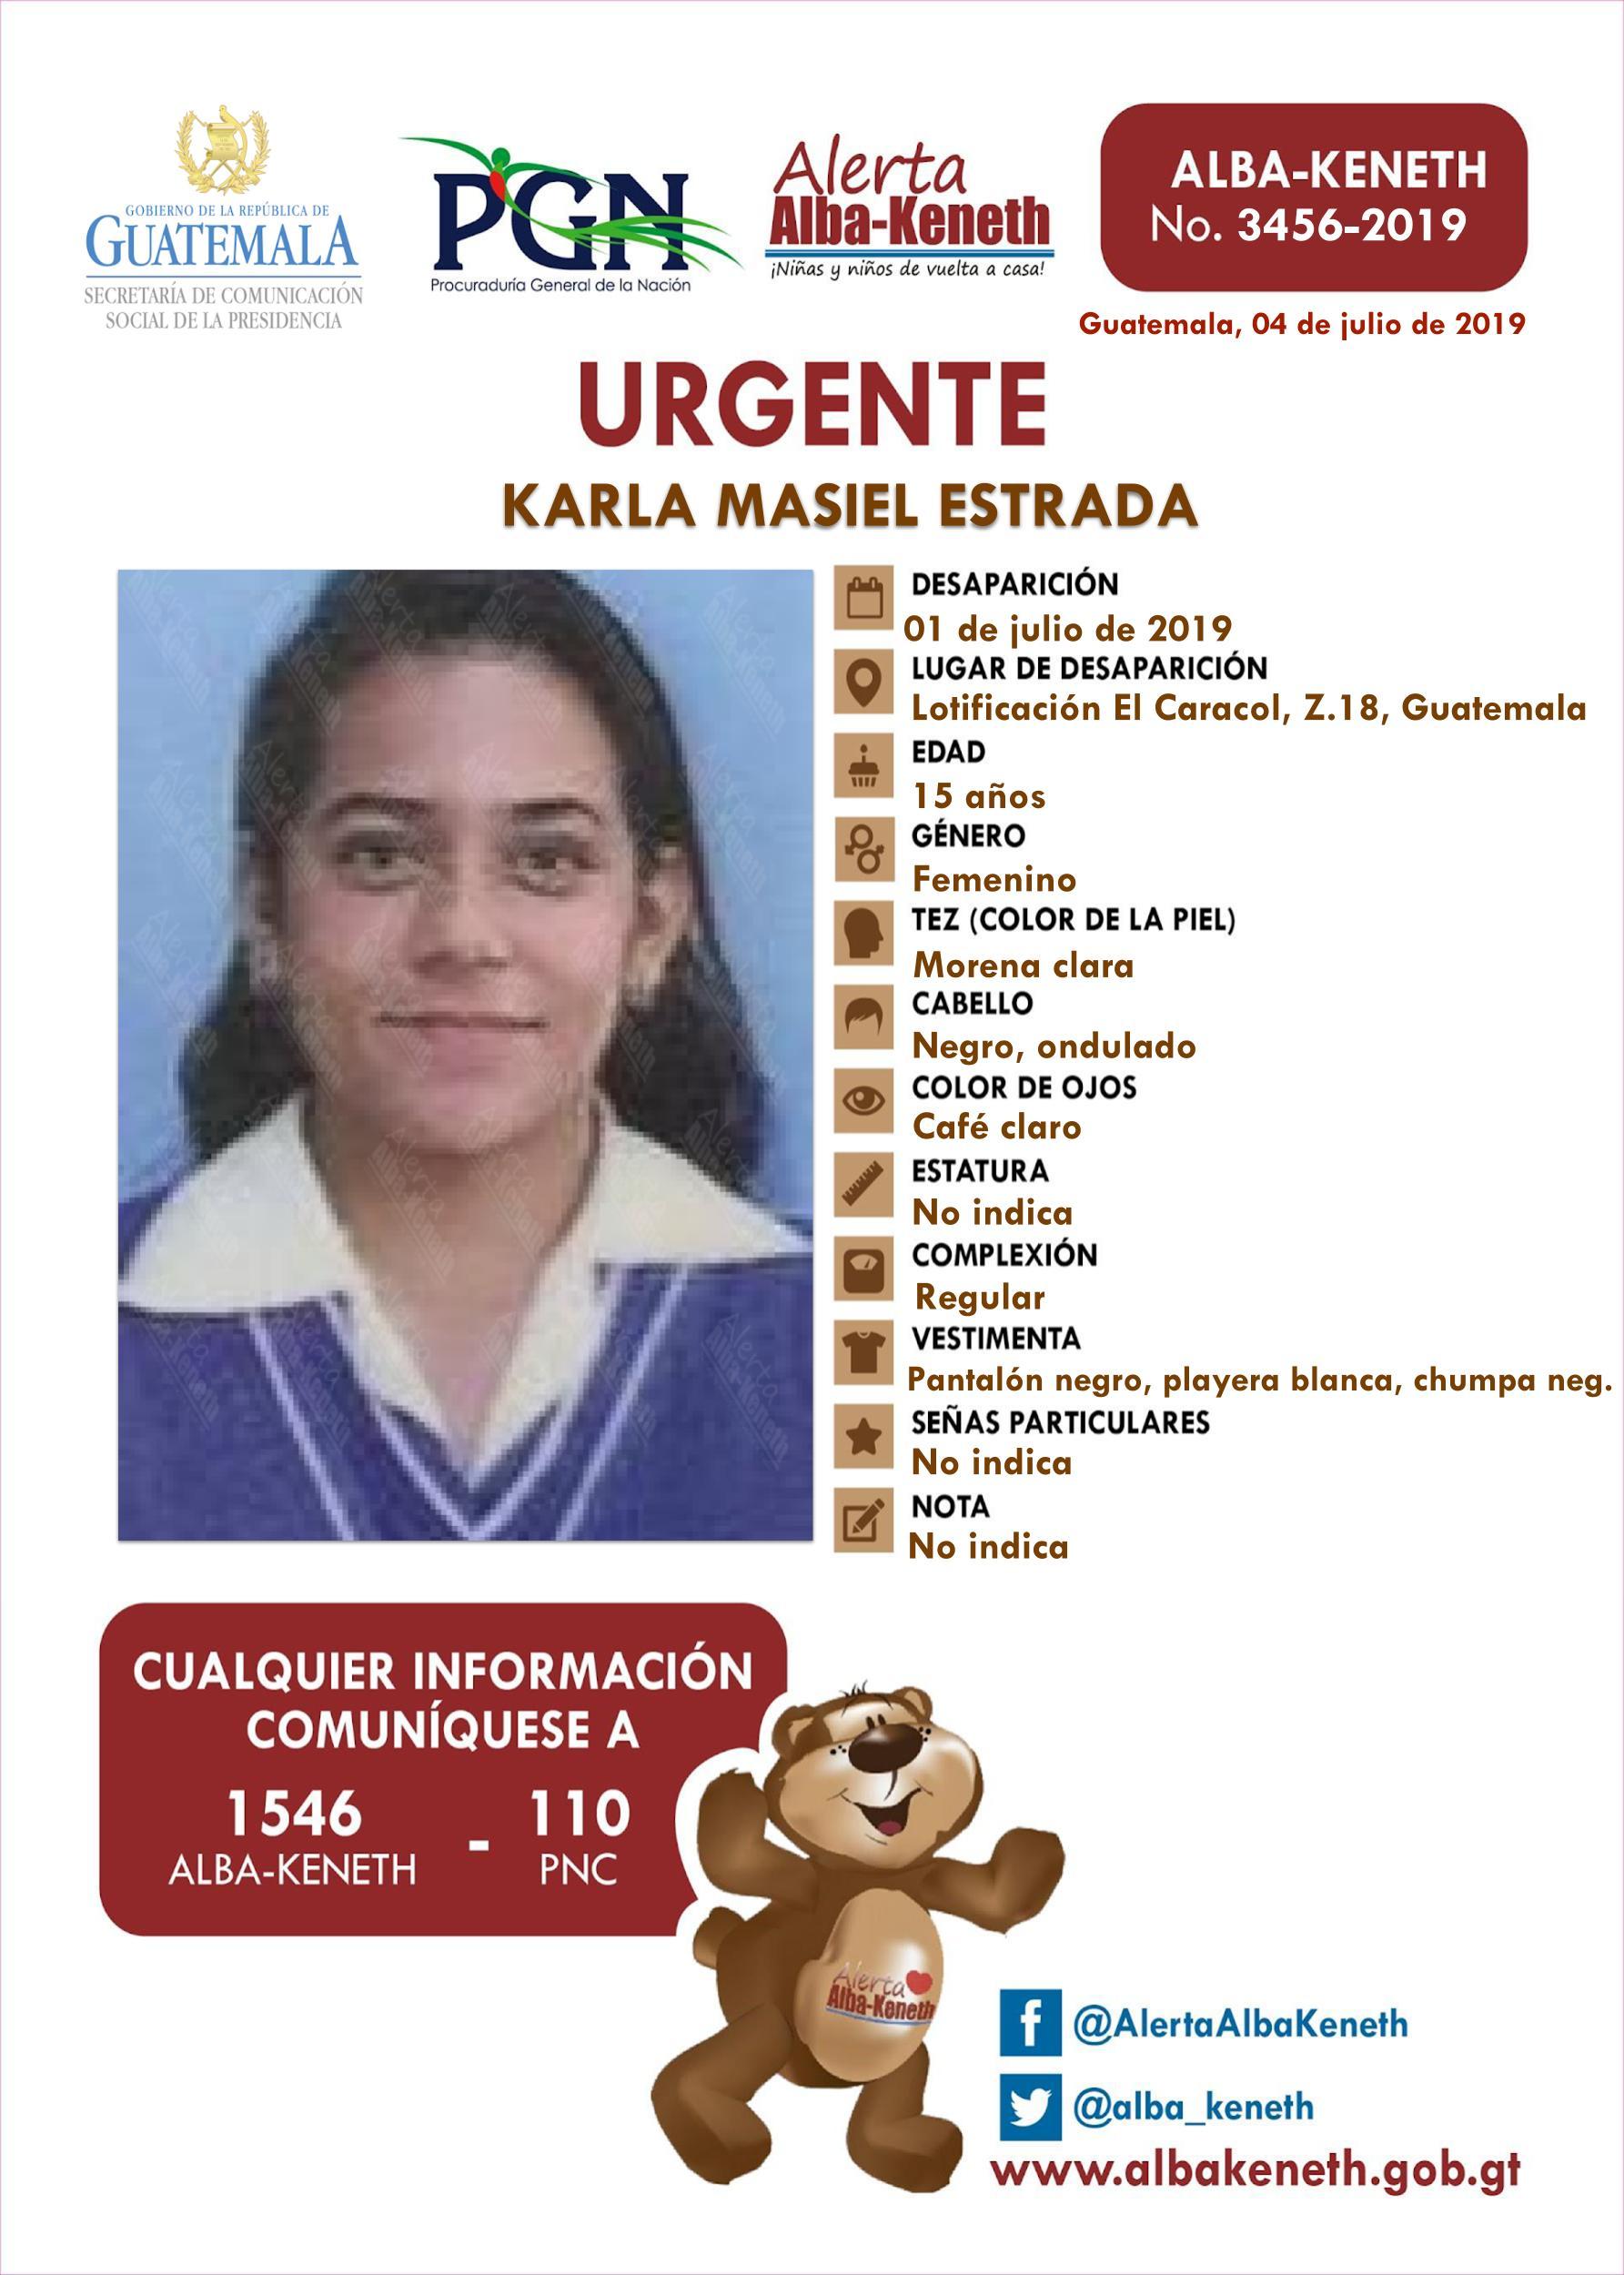 Karla Masiel Estrada